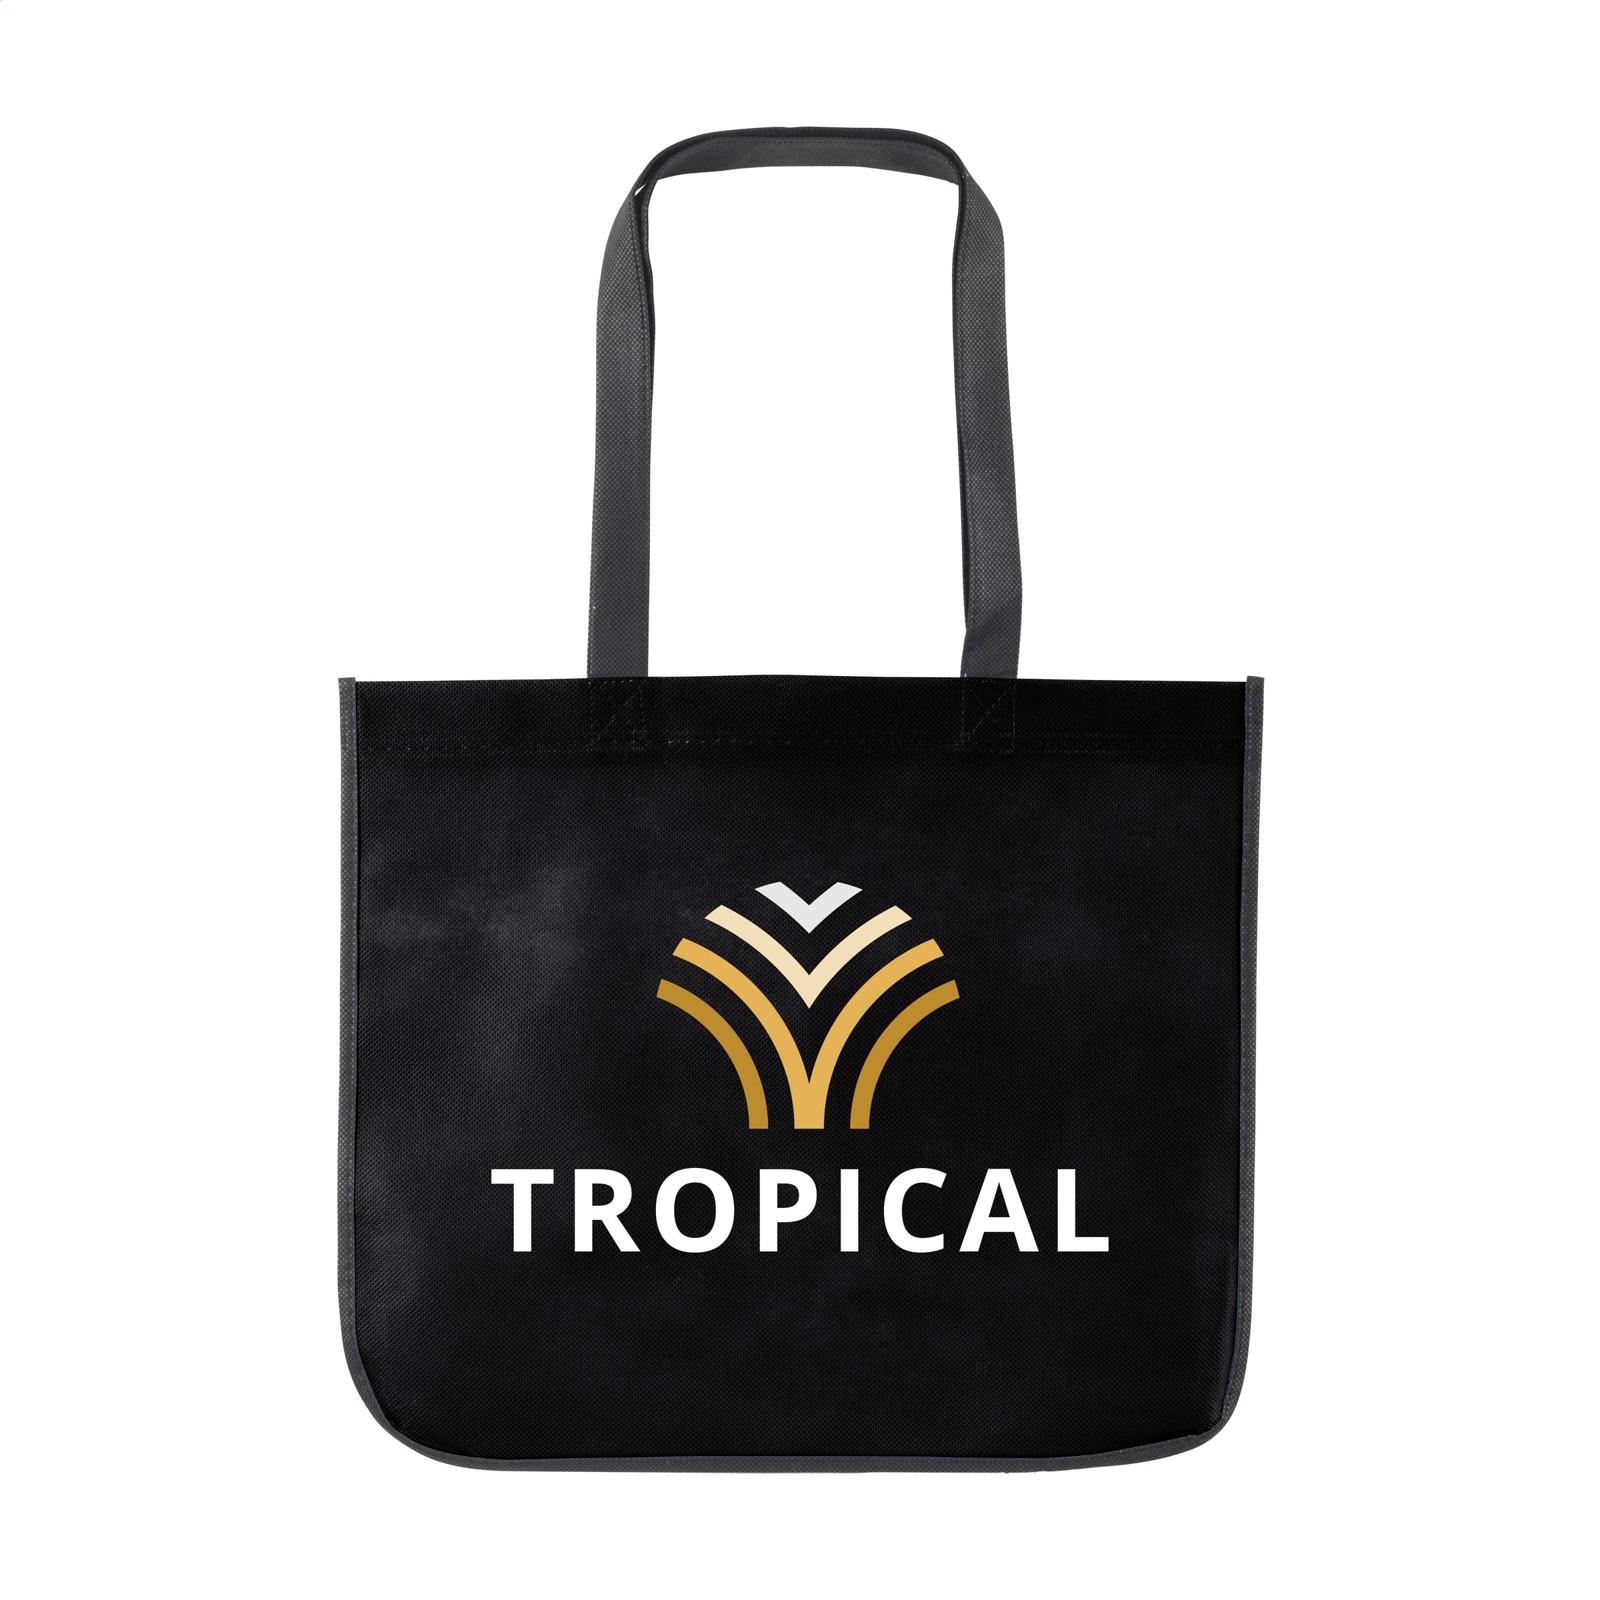 PromoShopper shopping bag - Black